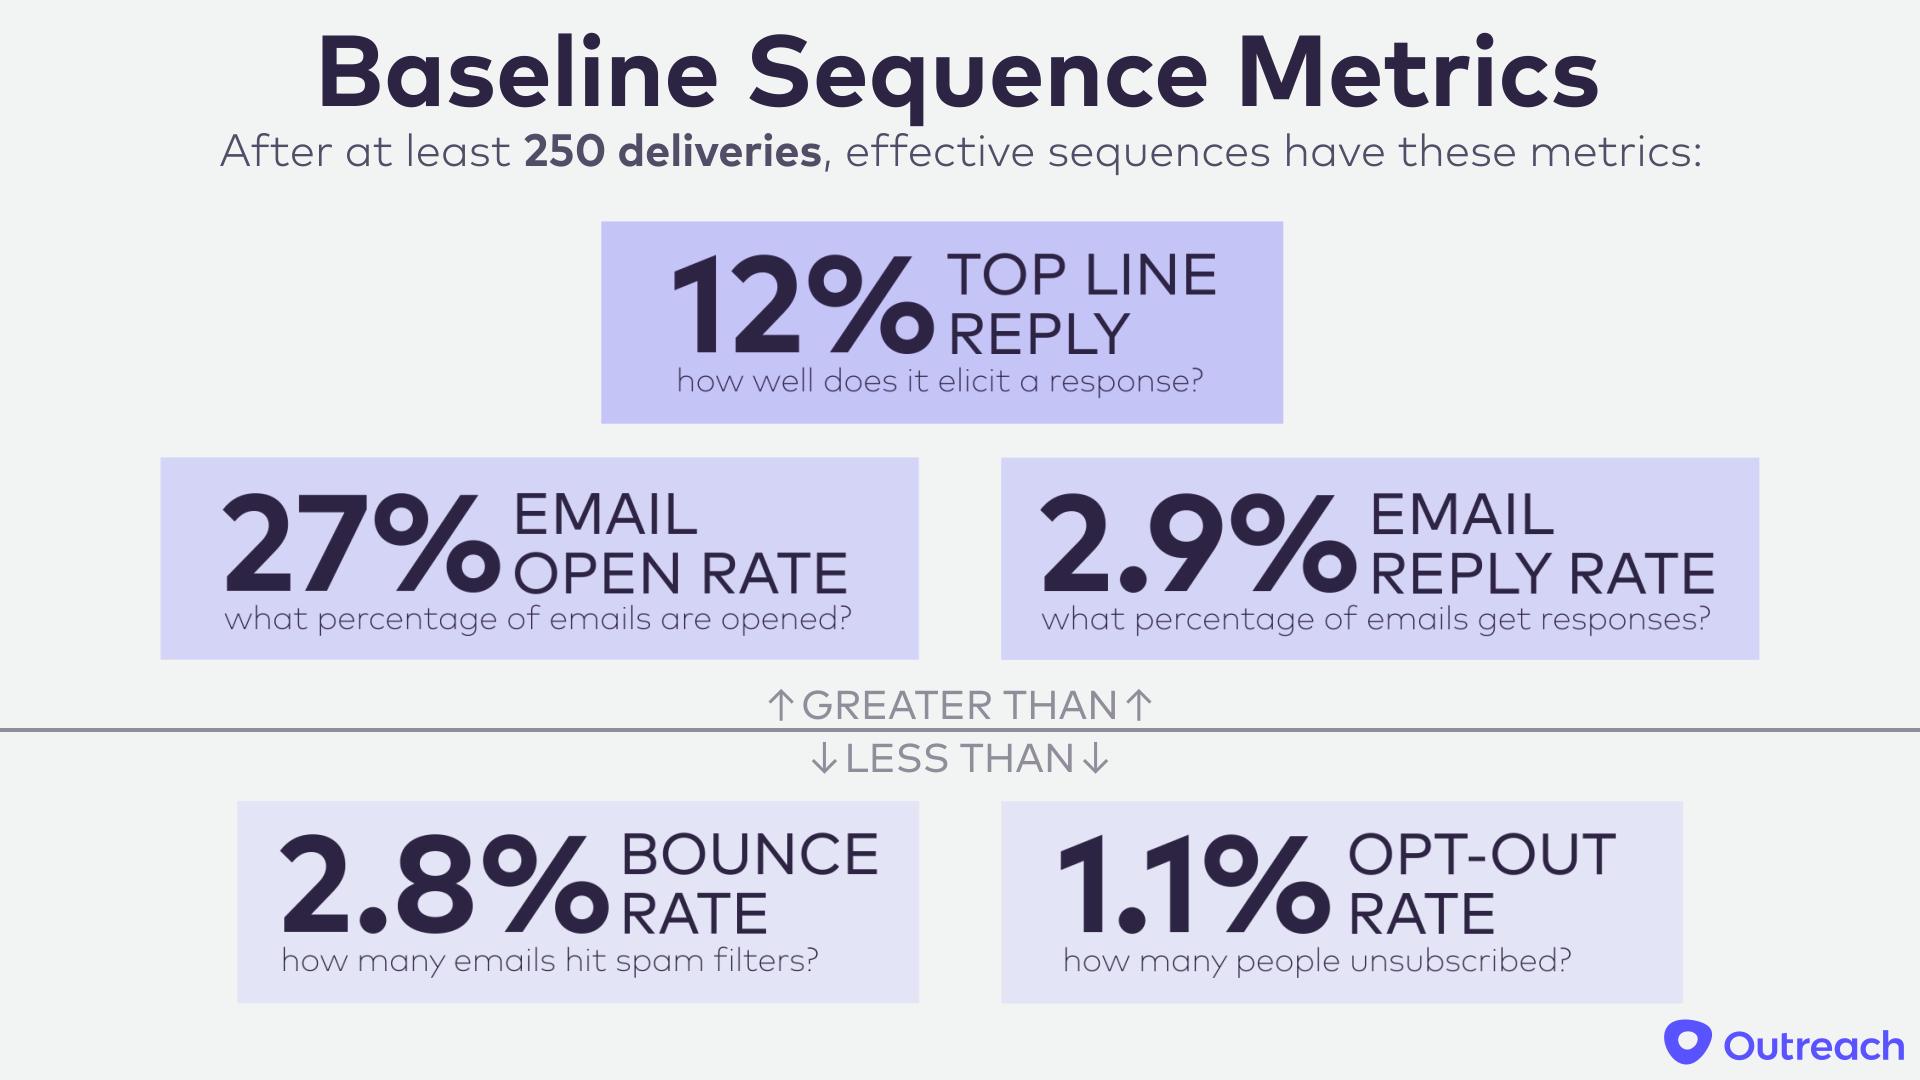 Nick-Baseline-Sequence-Metrics.png#asset:9074